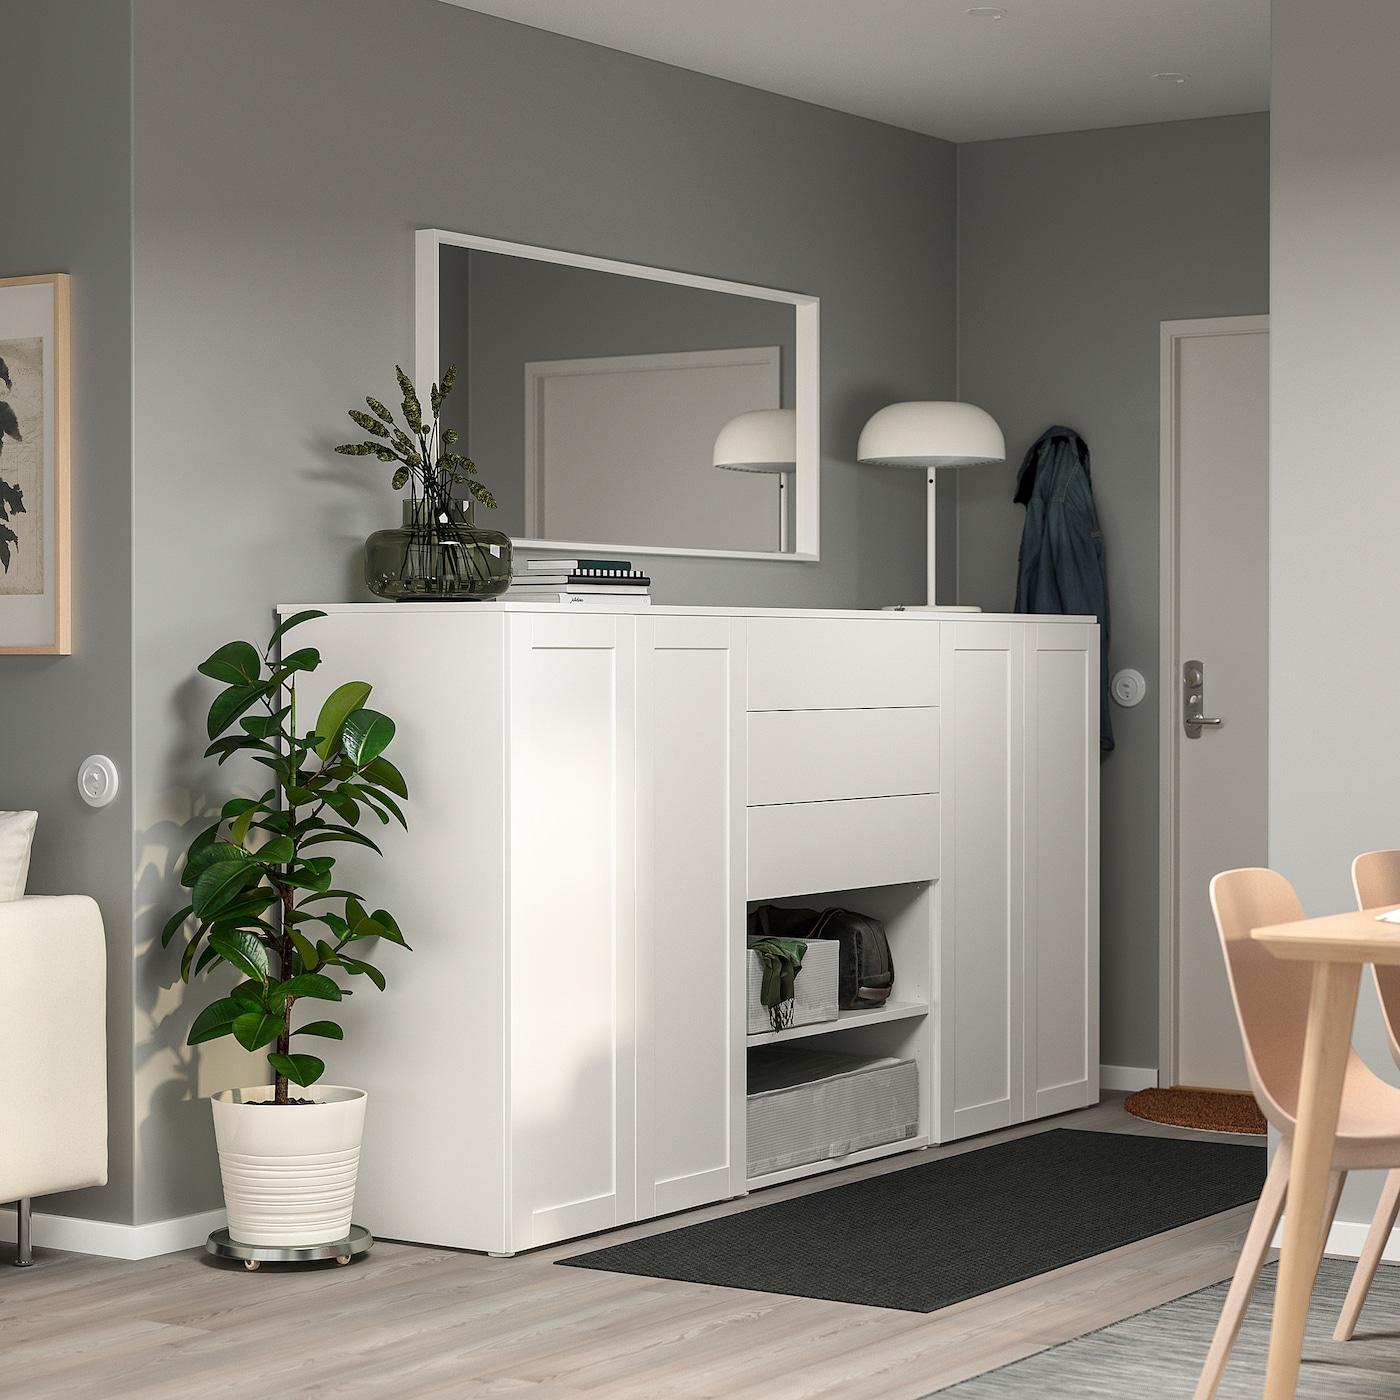 PLATSA Kleiderschrank, weiß/Fonnes Sannidal, 240x57x123 cm